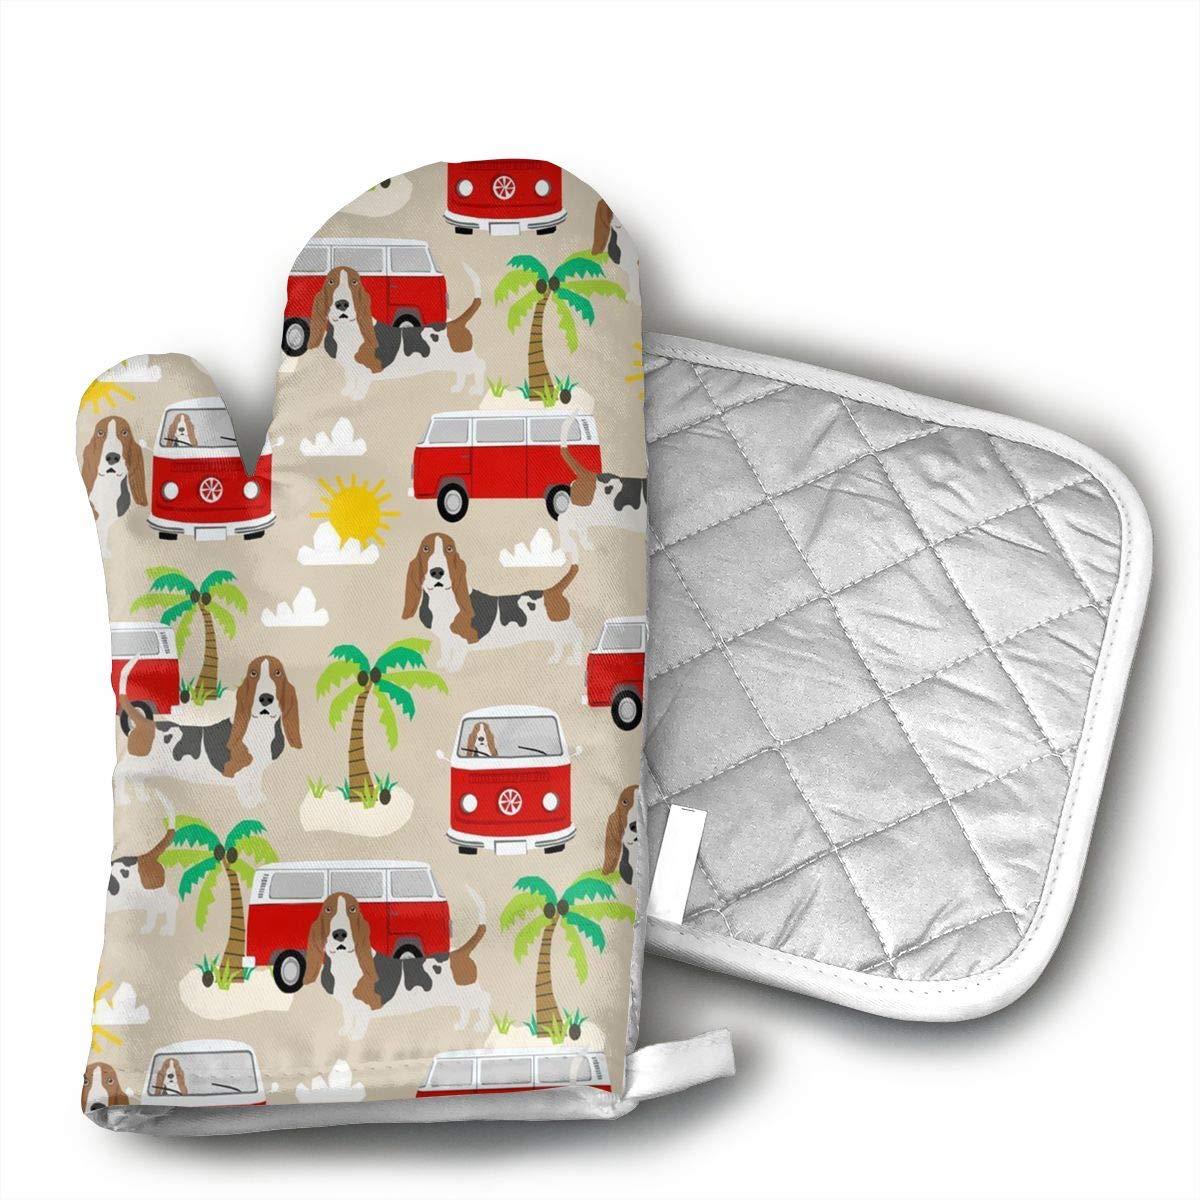 Basset Hound Dog Beach Bus Hippie Bus Palm Trees Cotton Oven Mitts Pot Holders Set - Kitchen Oven Mitt Heat Resistant, Non-Slip Grip Oven Gloves PotholderCooking,Baking & BBQ,